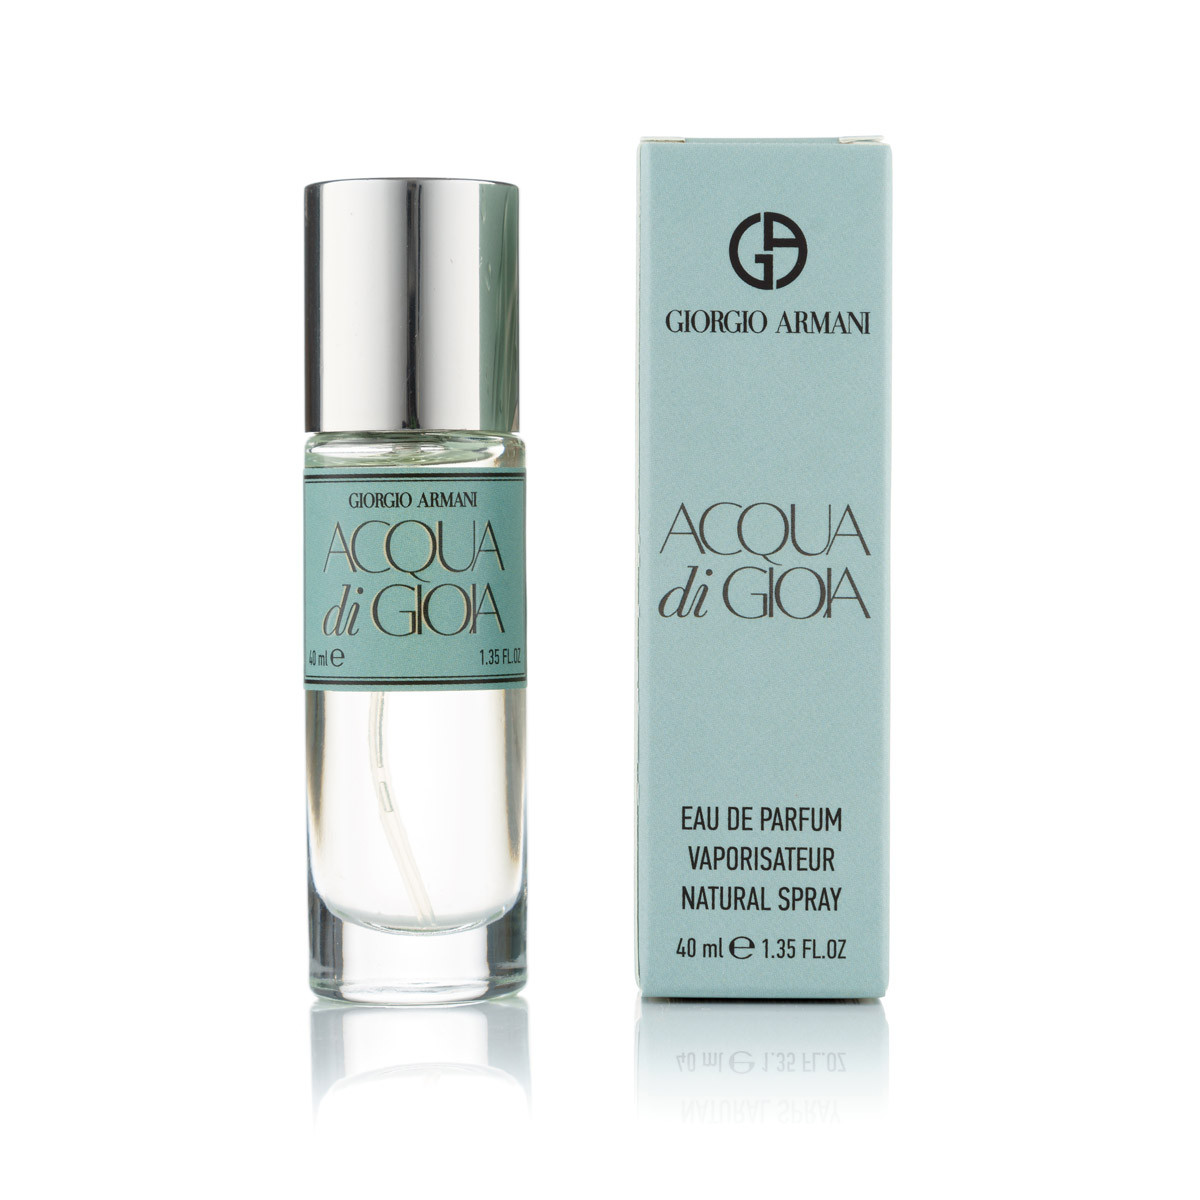 Жіночий міні парфум Giorgio Armani Acqua Di Gioia 40 Ml